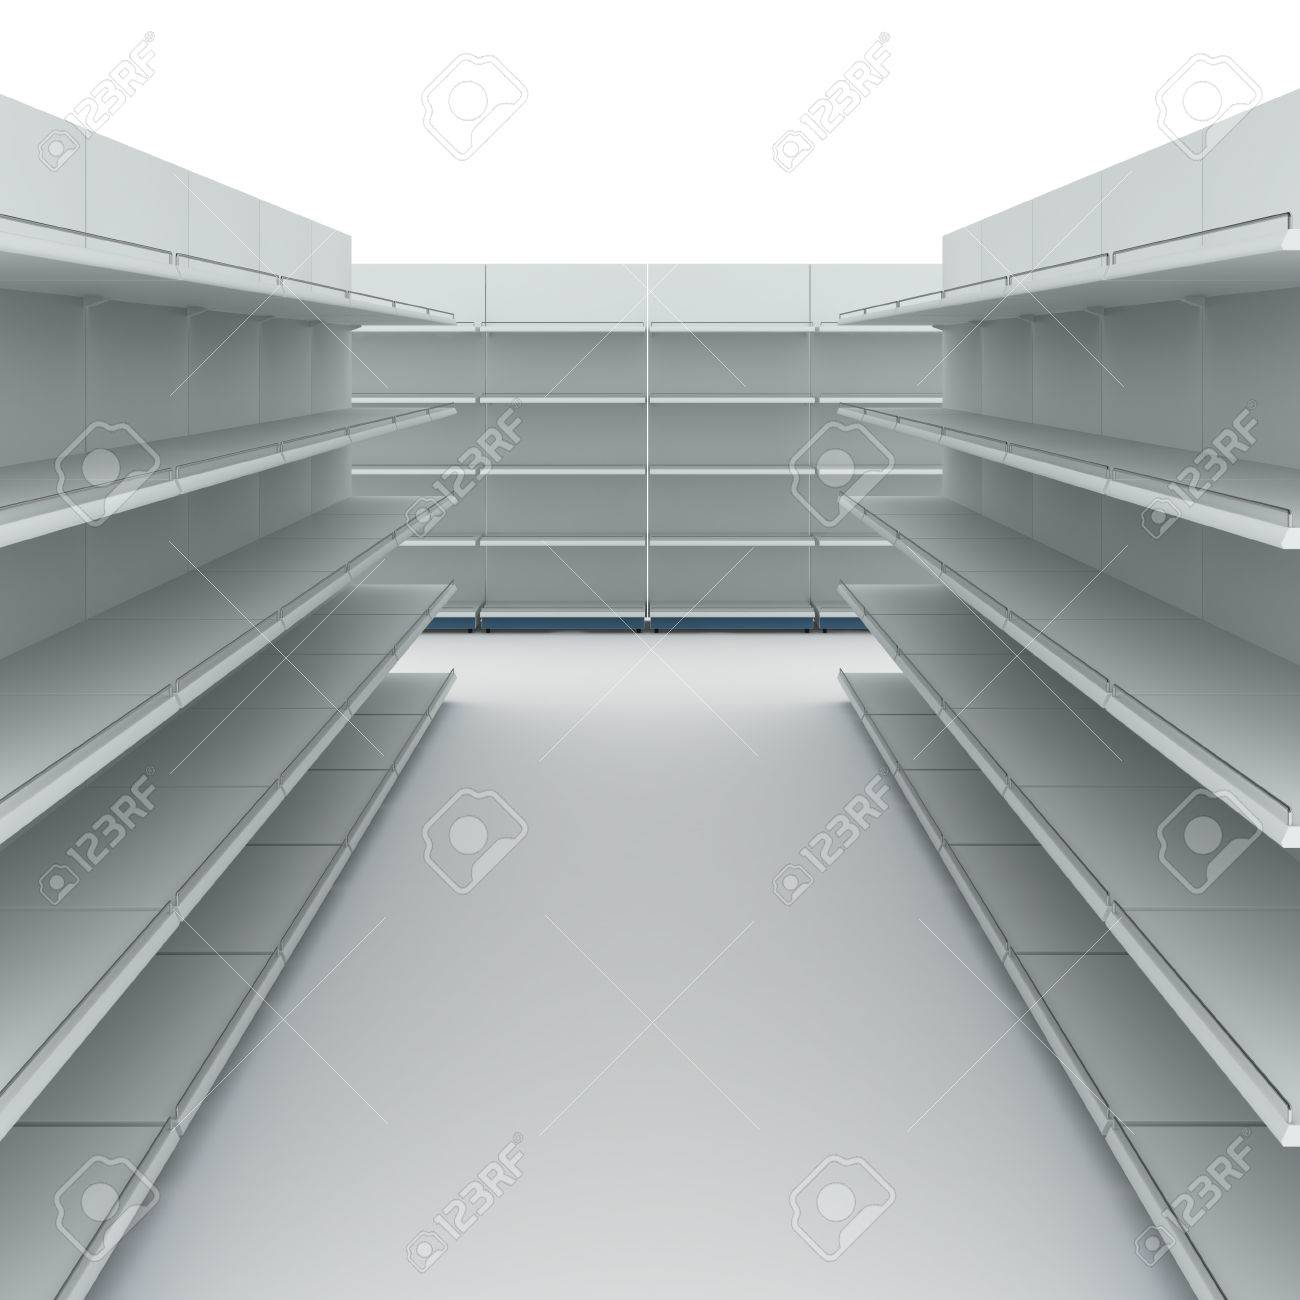 Empty supermarket shelves - 28869811